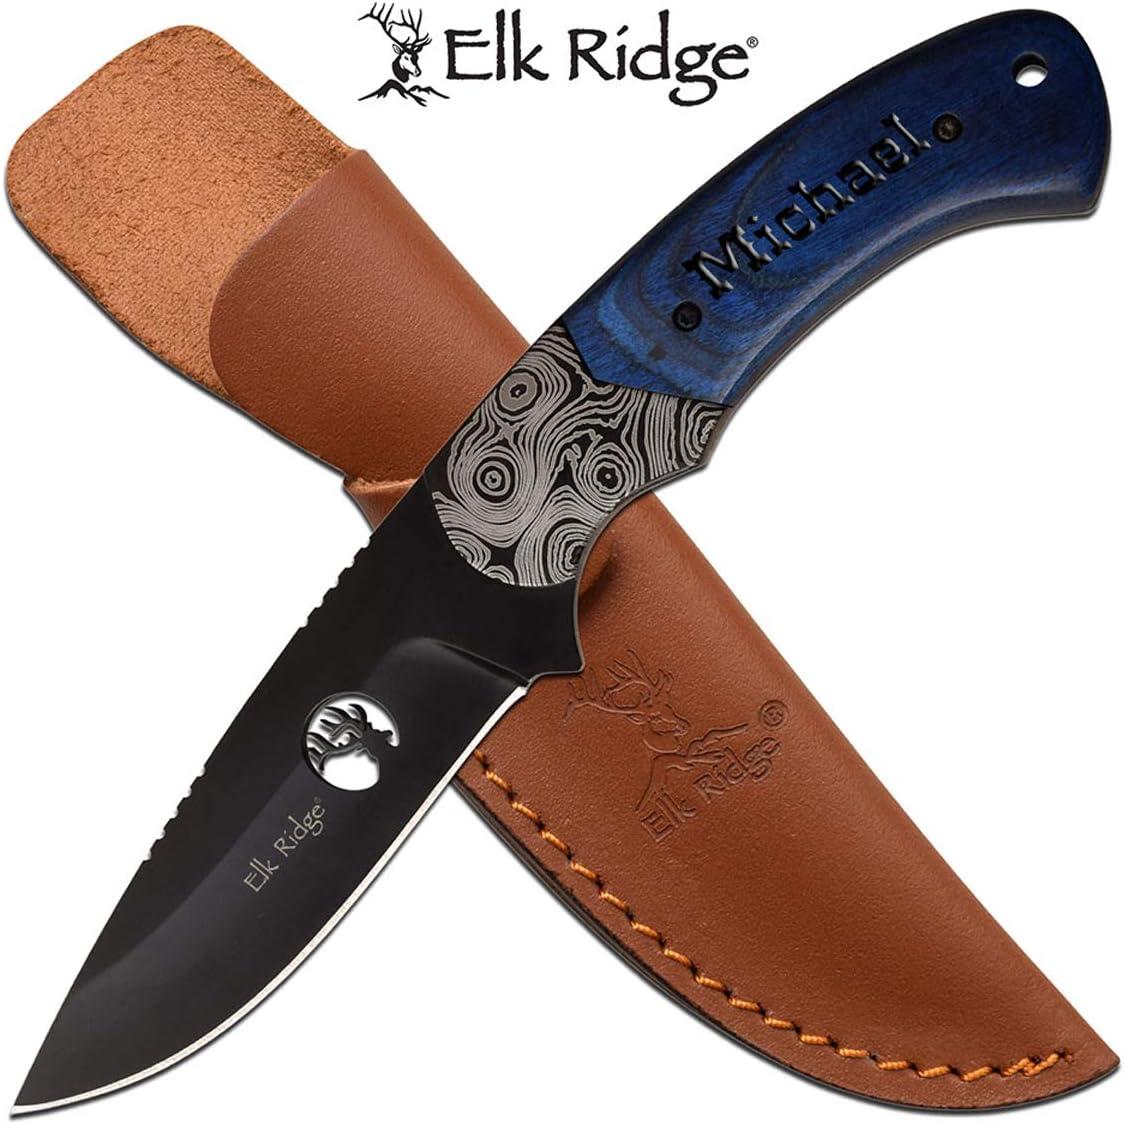 Elk Ridge Free Engraving - Quality Pocket Knife (ER-200-09BL)